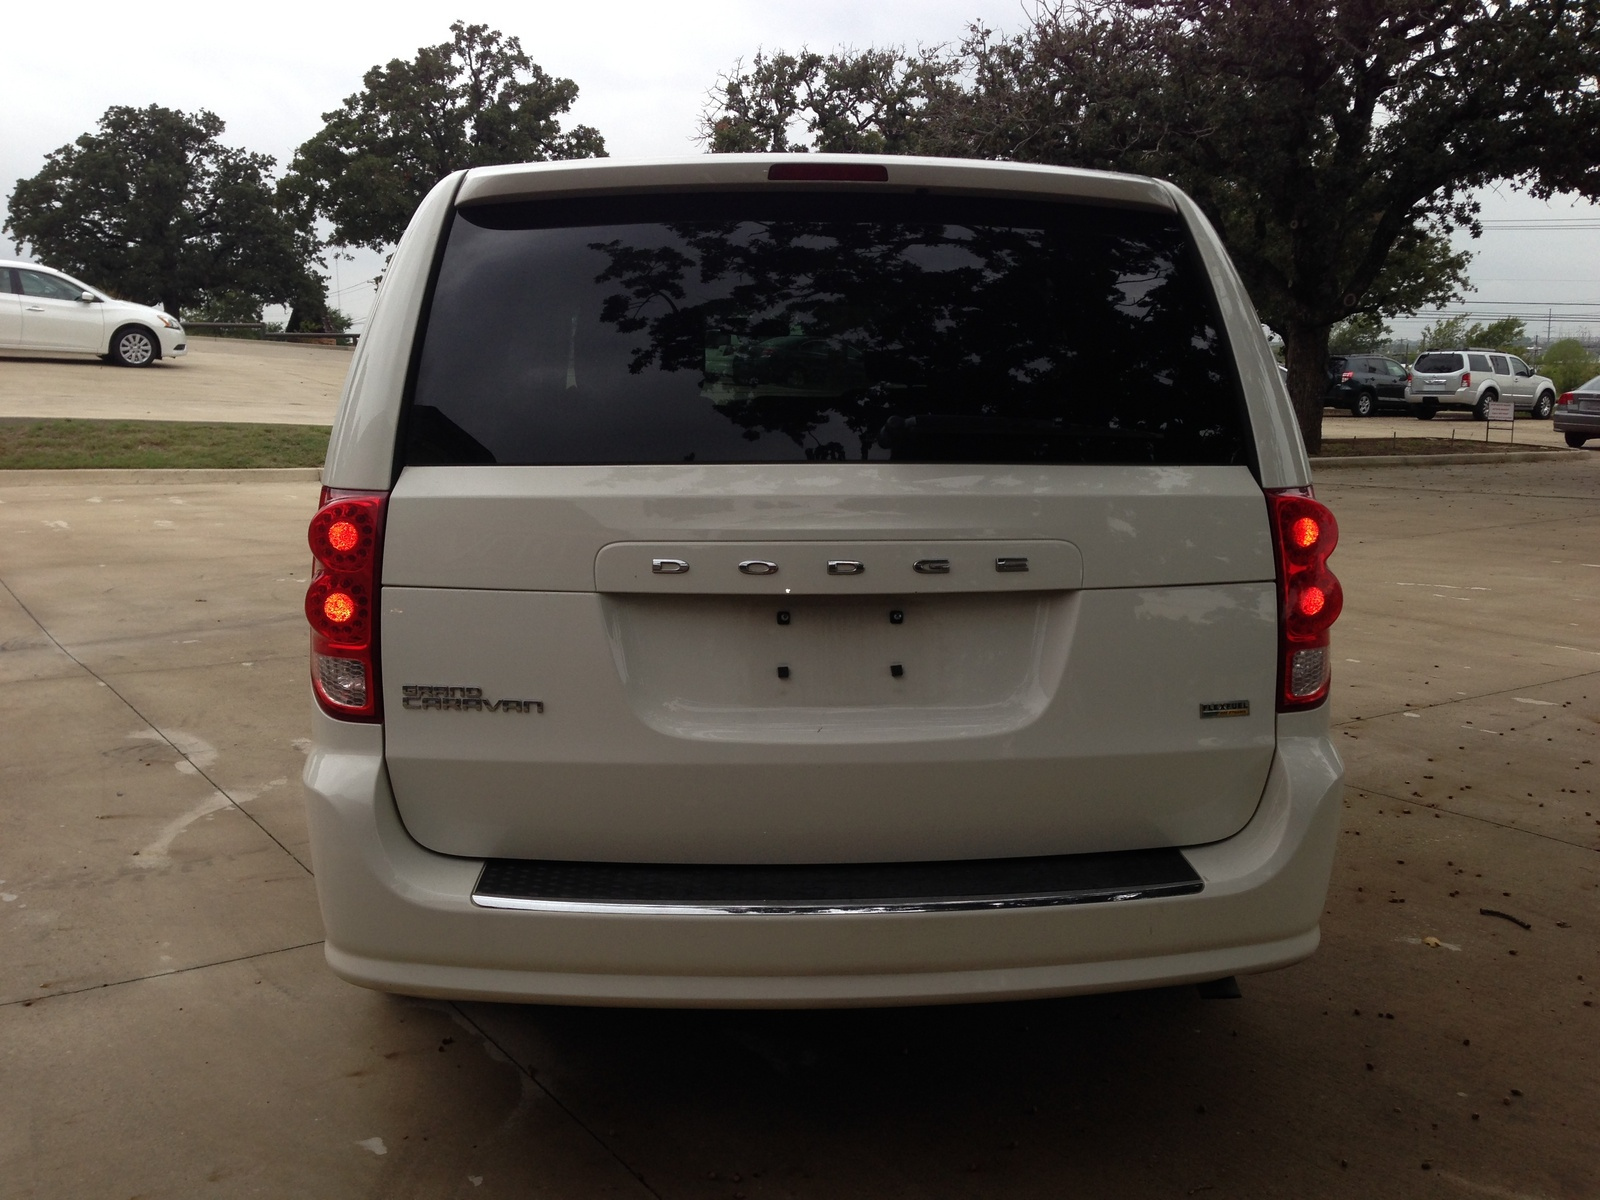 2013 dodge minivan prices photos ratings and reviews aol autos weblog. Black Bedroom Furniture Sets. Home Design Ideas